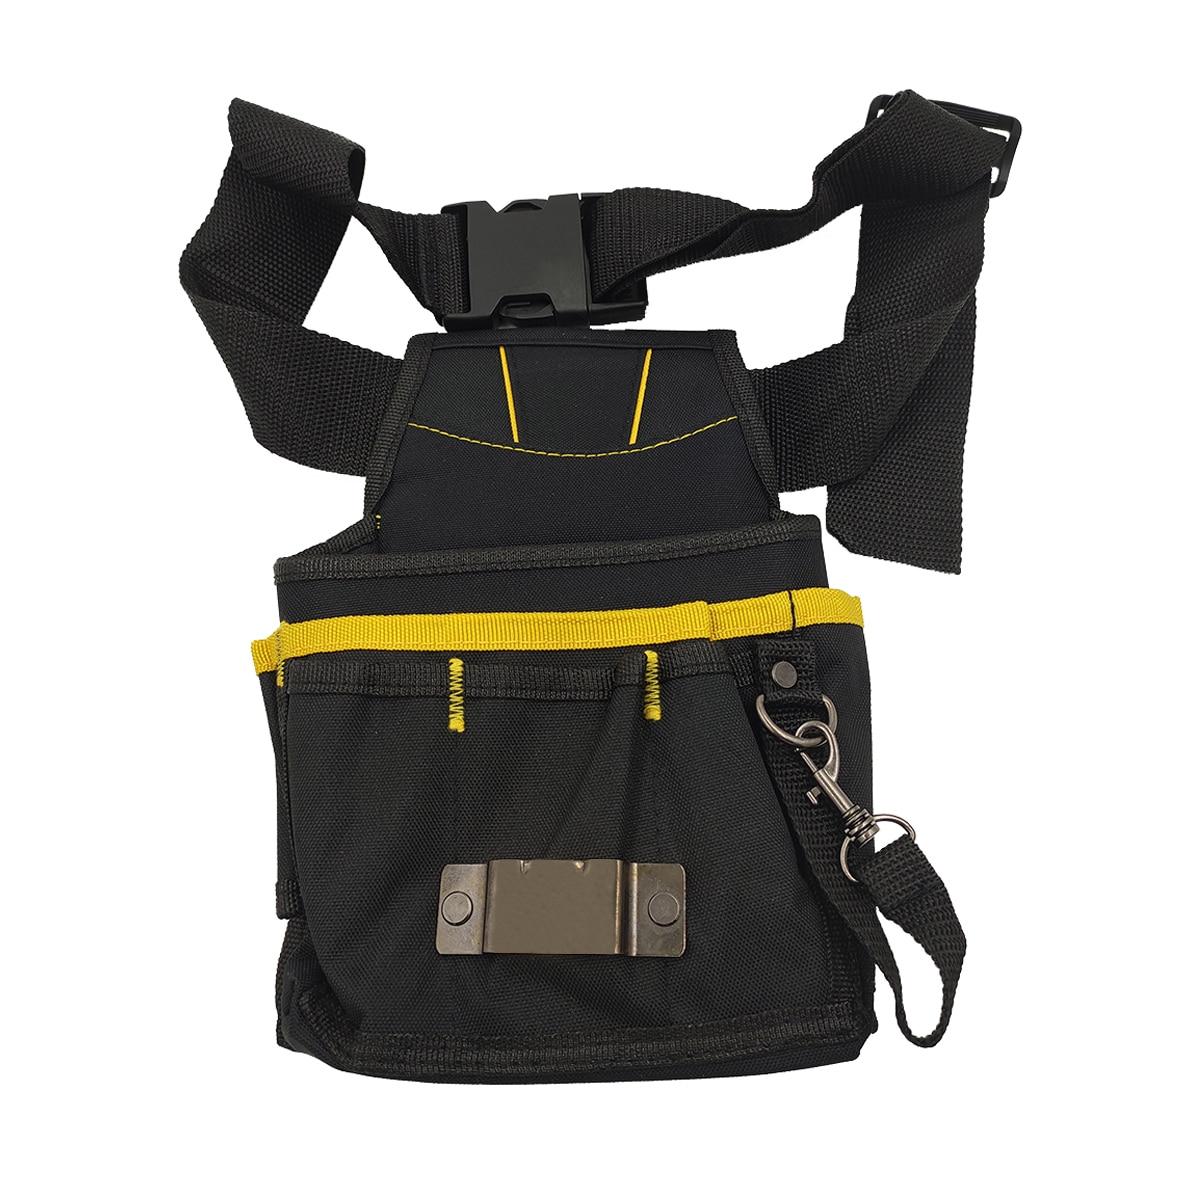 Professional Vinyl Wrap Car Tools Bag Oxford Cloth Pouch Bag Waist Belt Organizer Durable Hardware Tint Tools Utility Bags D17